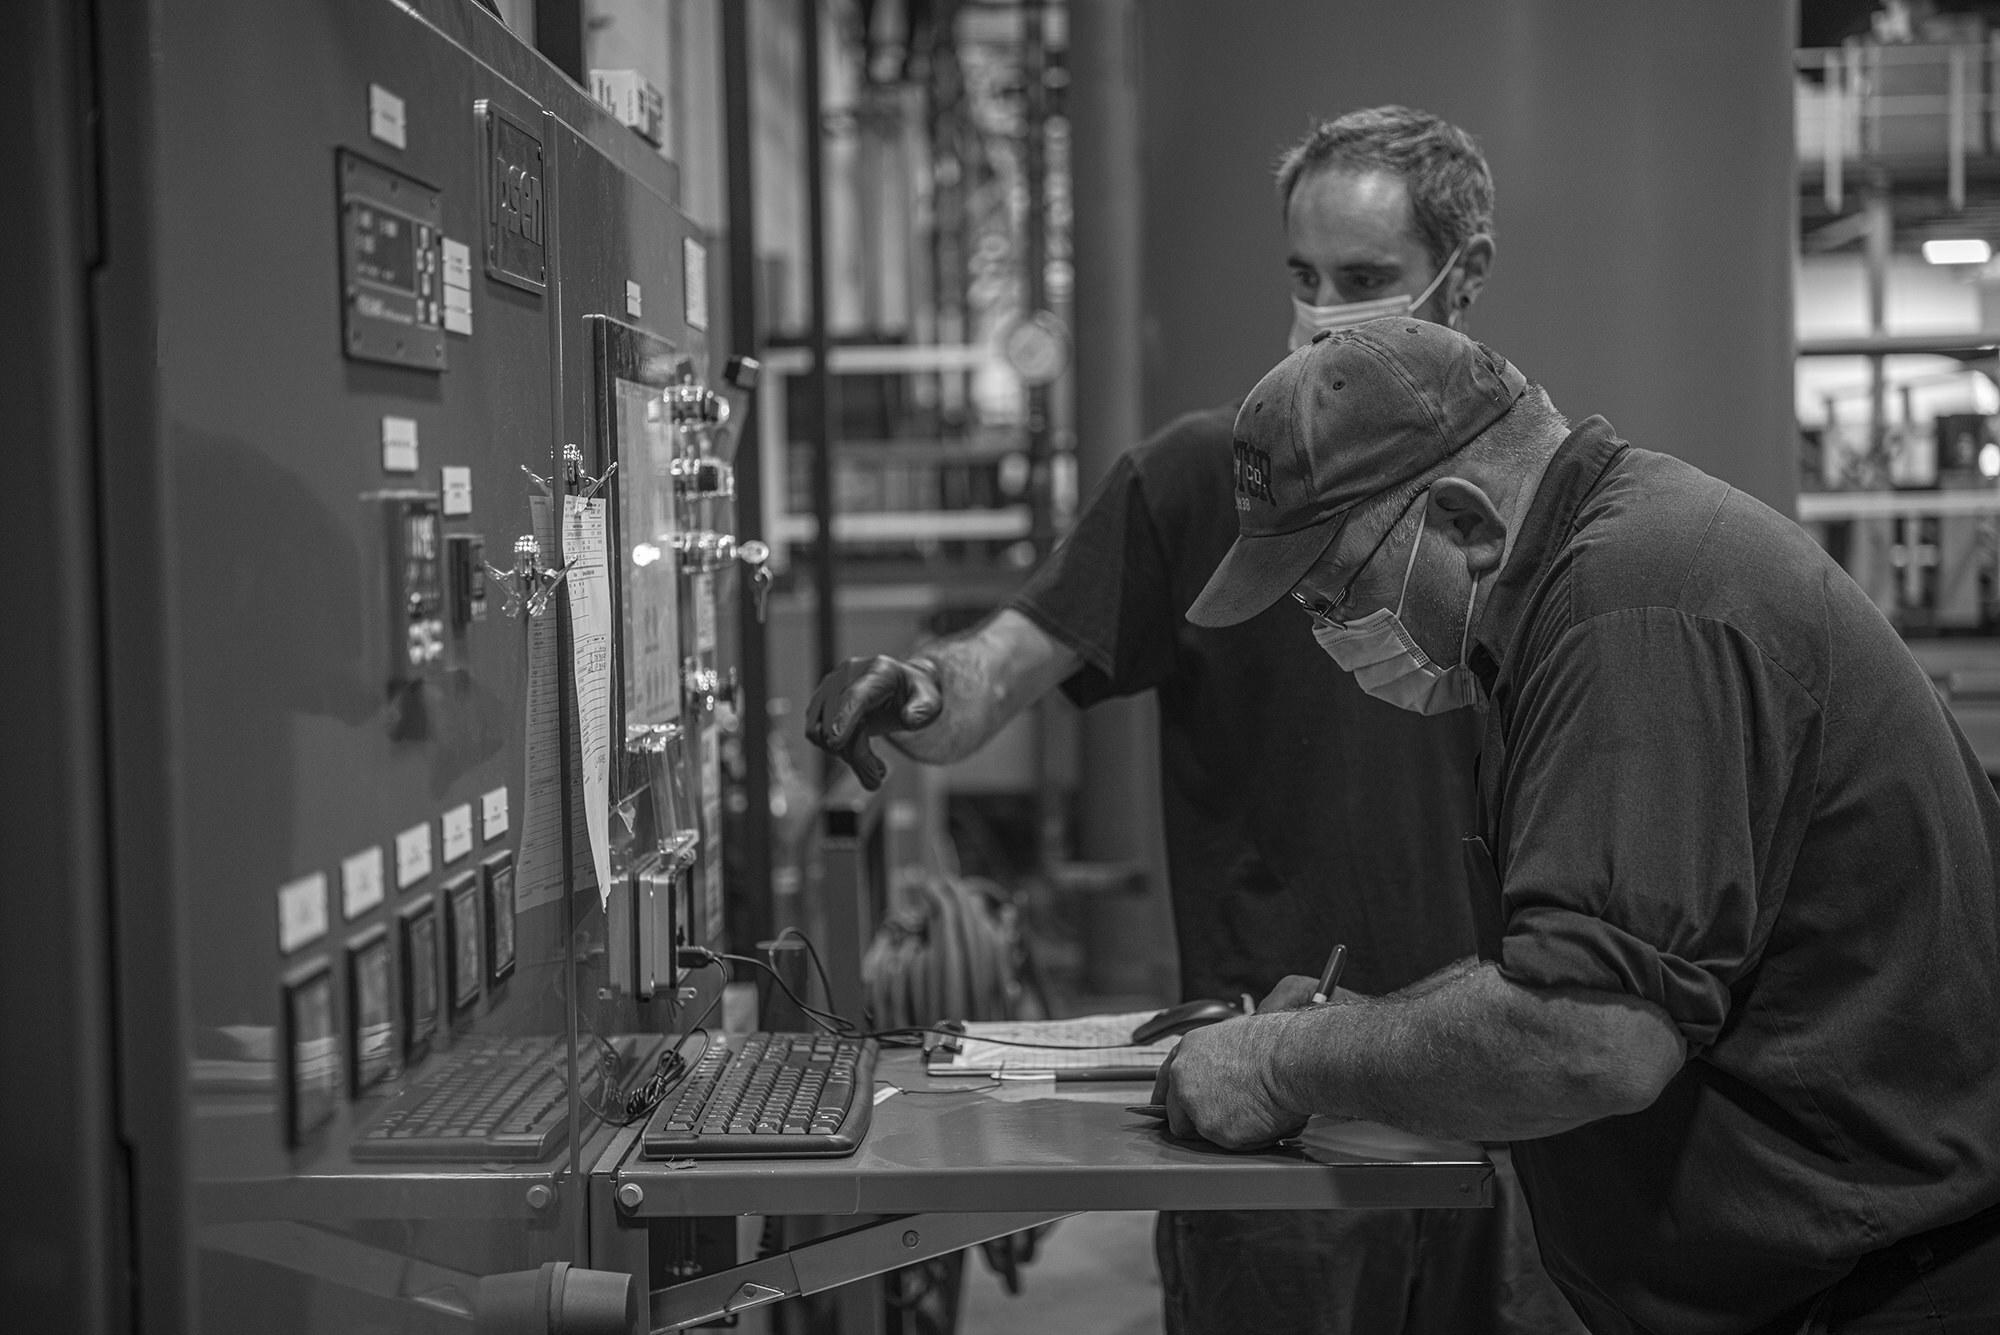 Vacu Braze team works with heat treatment machinery